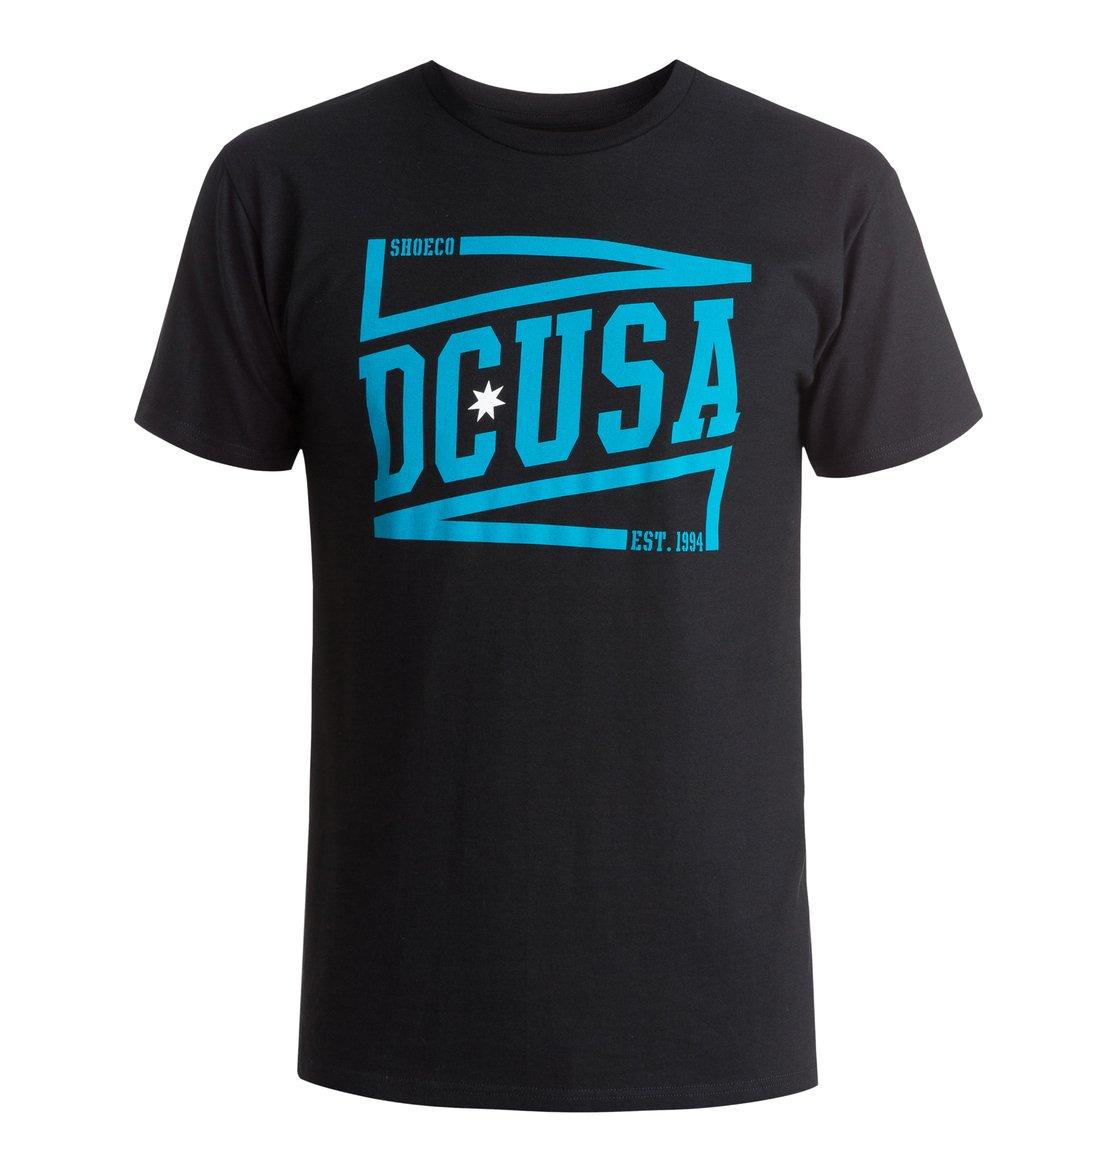 Blueliner T-Shirt